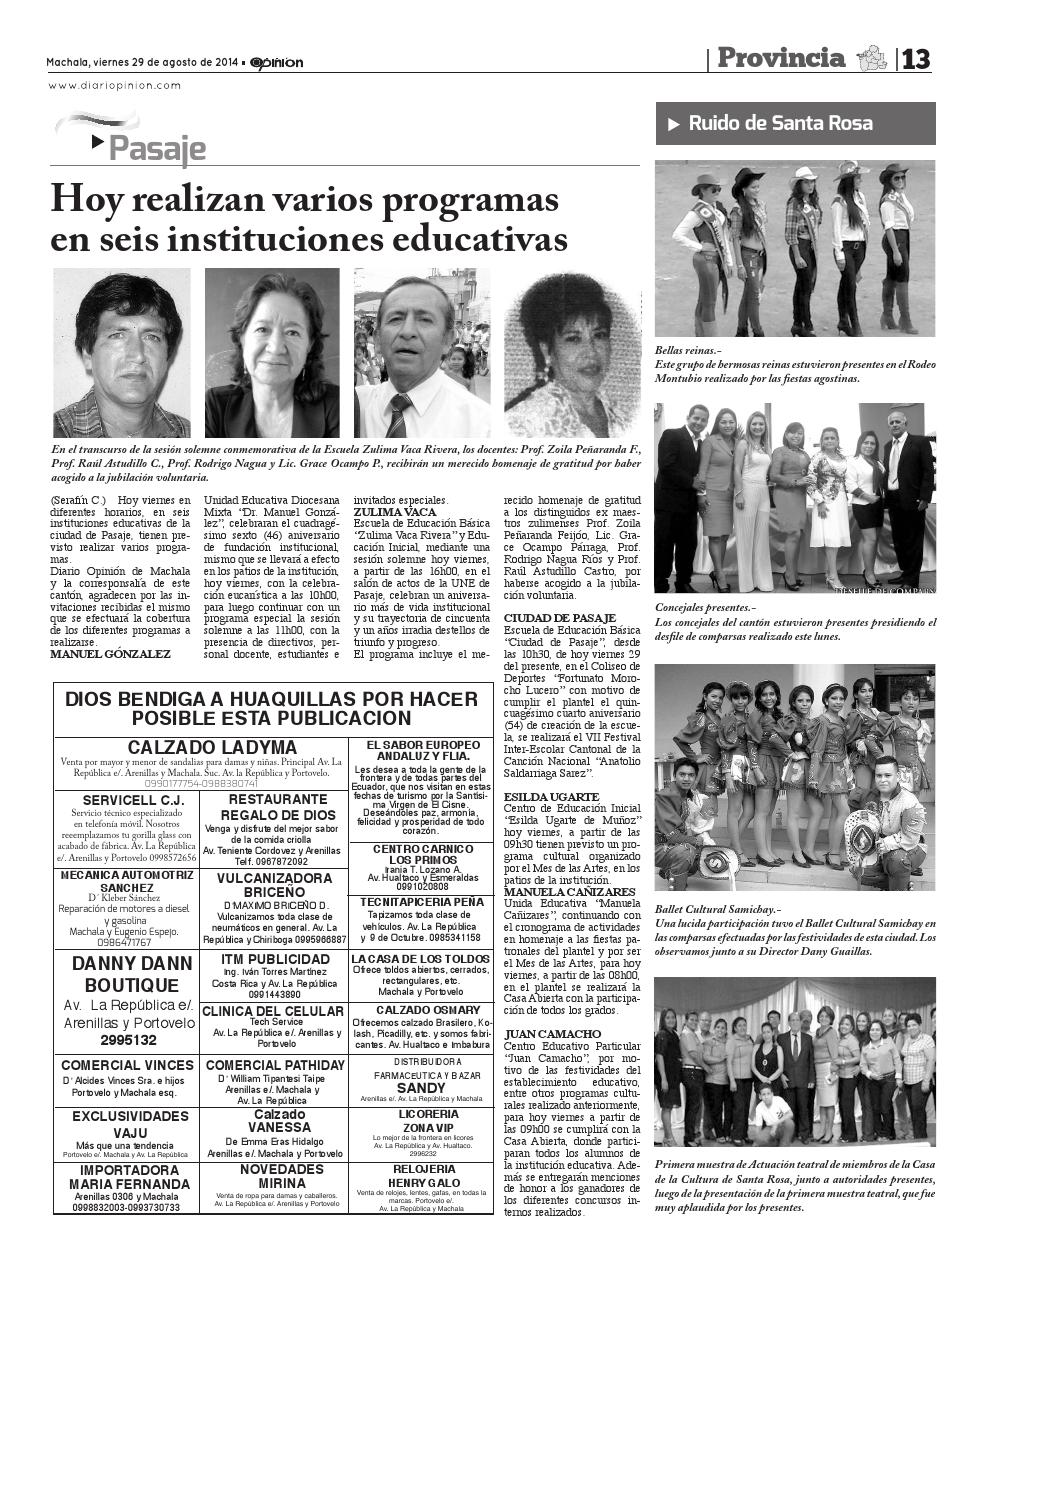 08 Issuu Diario By Impreso 14 Opinion 29 fgvIm6byY7